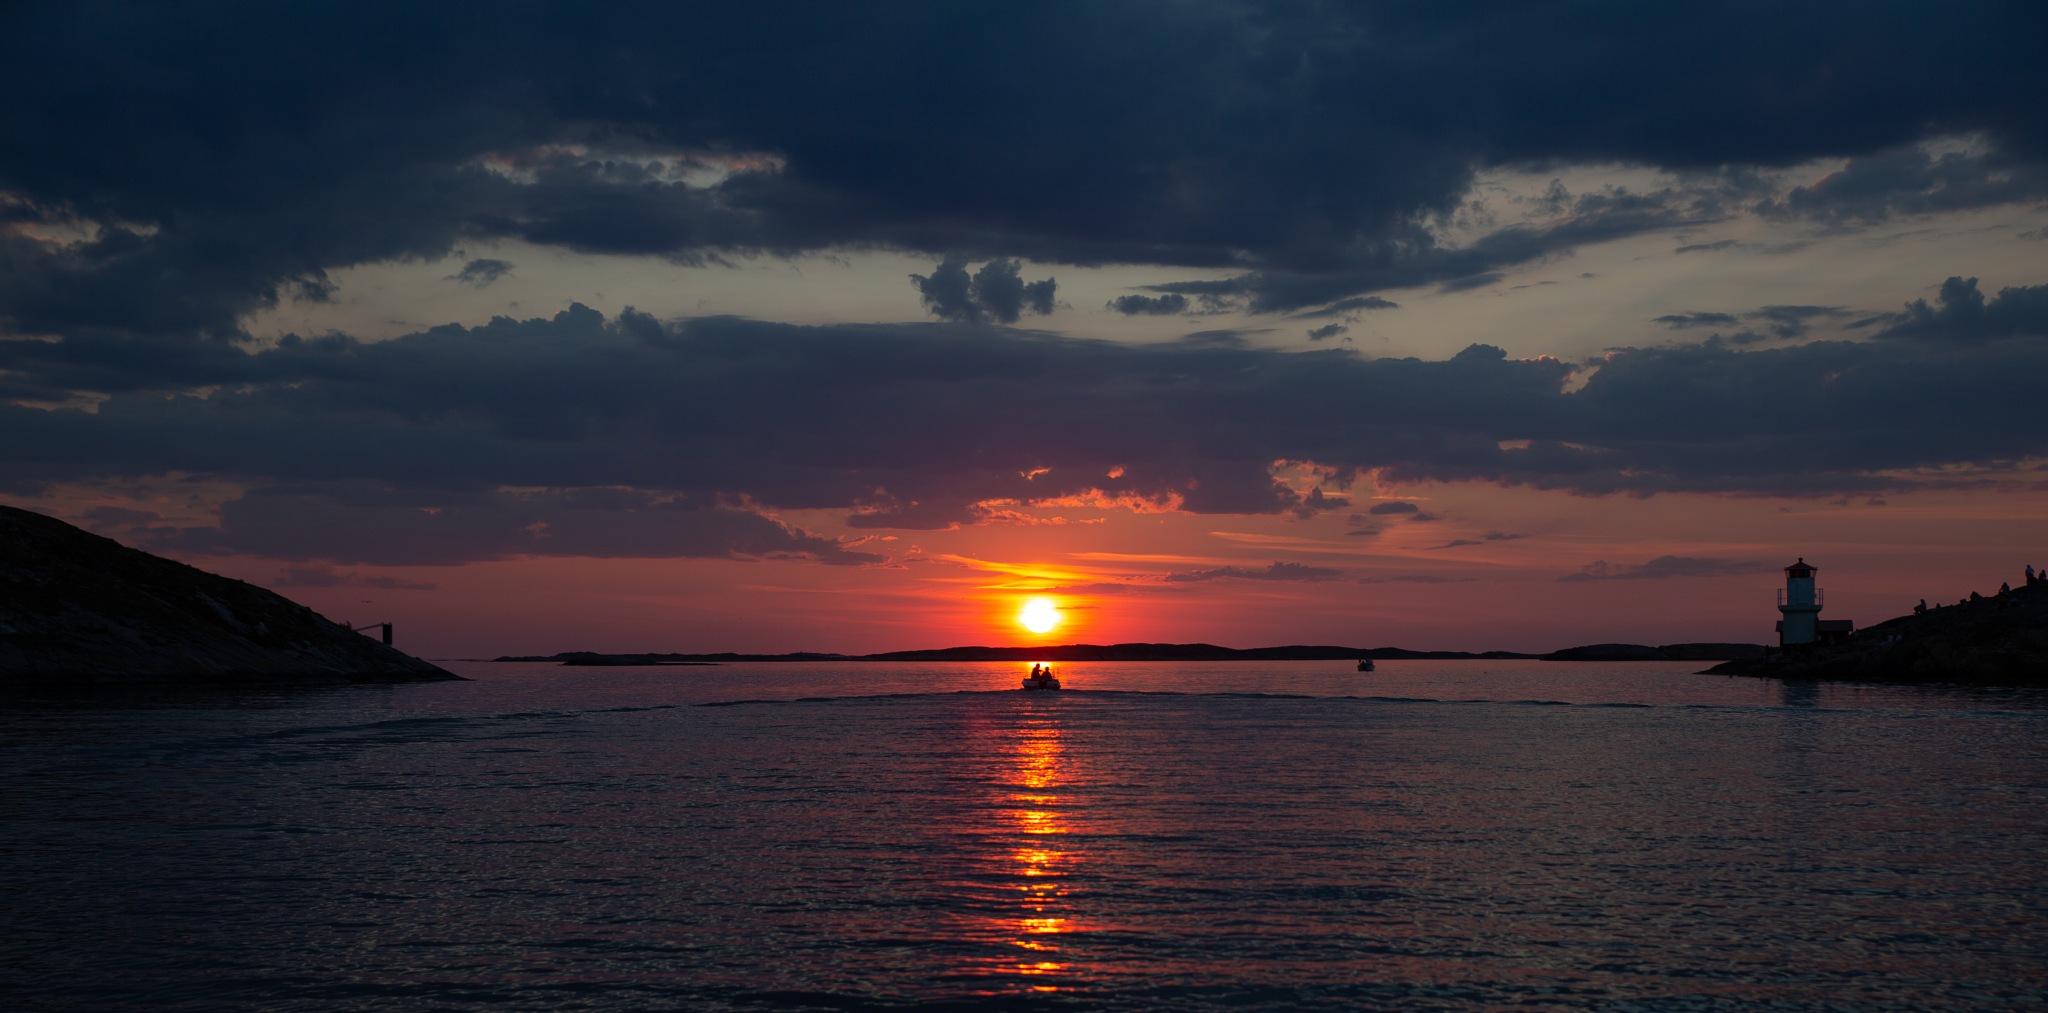 Summernight on the Swedish westcoast by UlrikaE